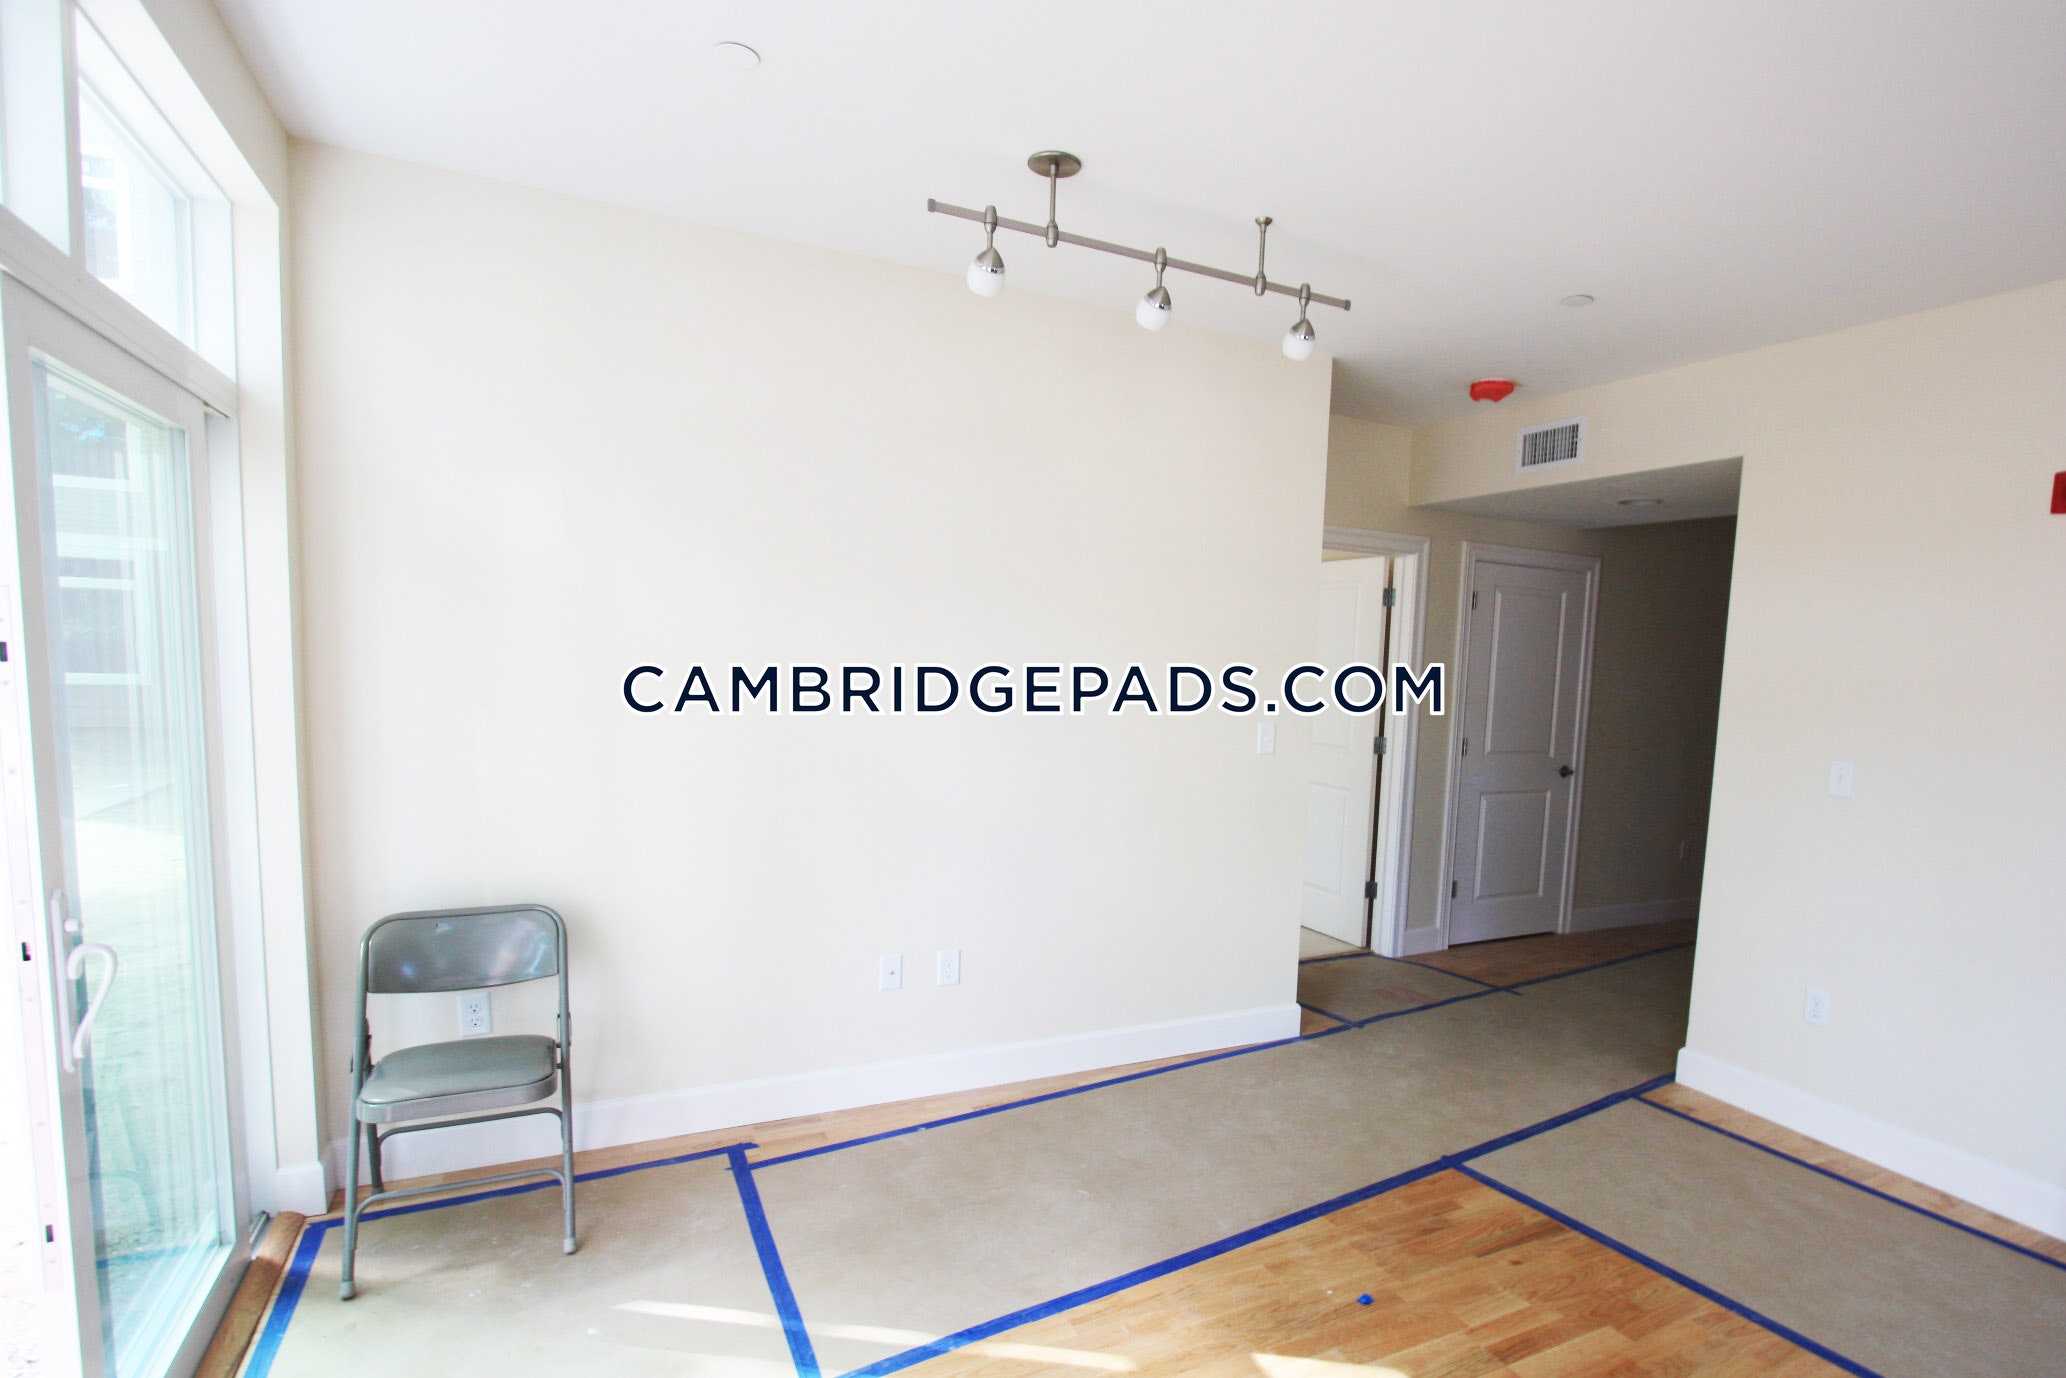 CAMBRIDGE - DAVIS SQUARE - $3,800